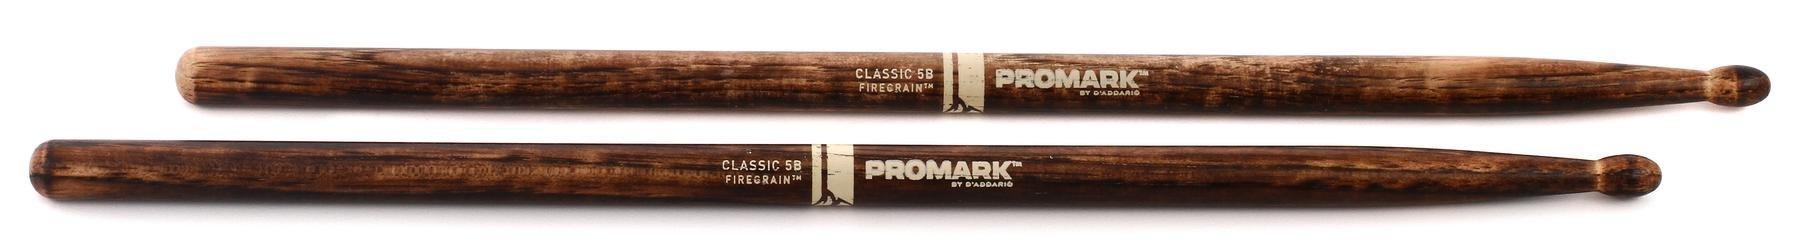 Promark Classic 5B Firegrain